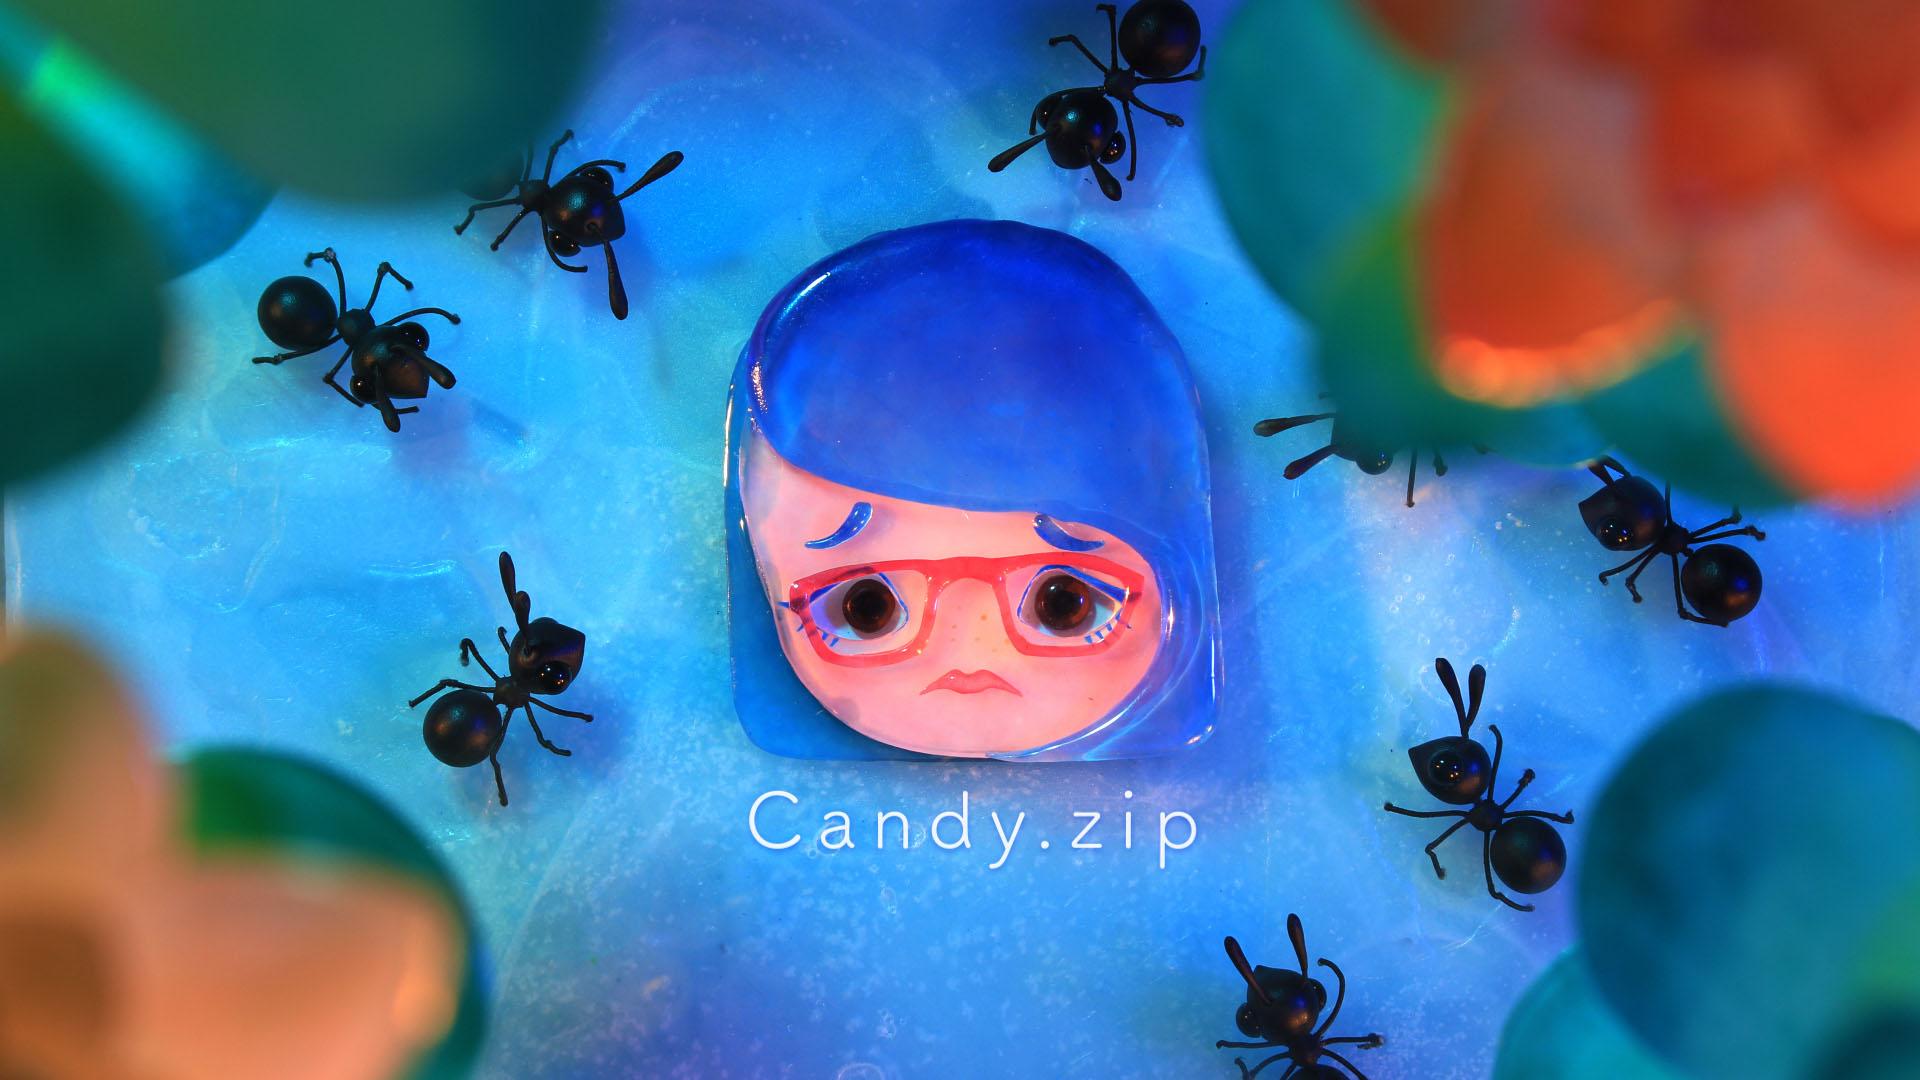 Candy.zip / 見里 朝希